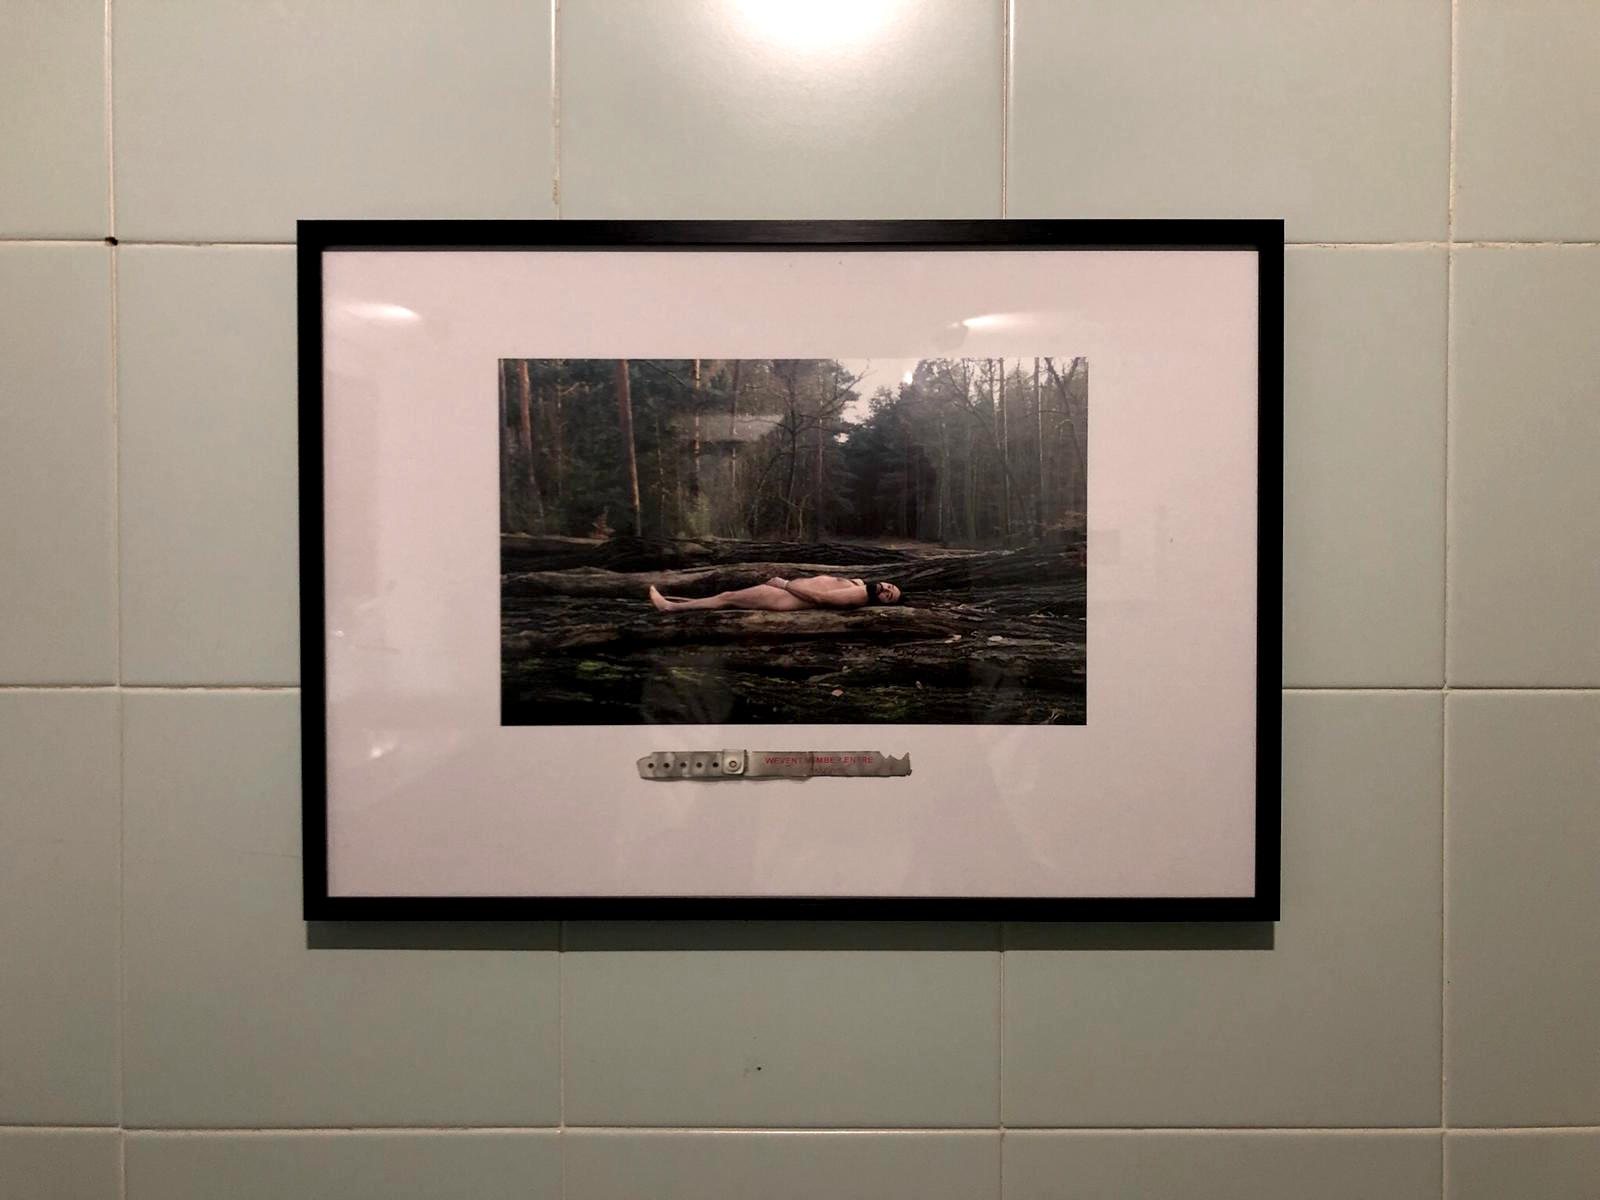 Untitled, Fadi Al-Hamwi, Photograph and identity band Giclee printed, 2018